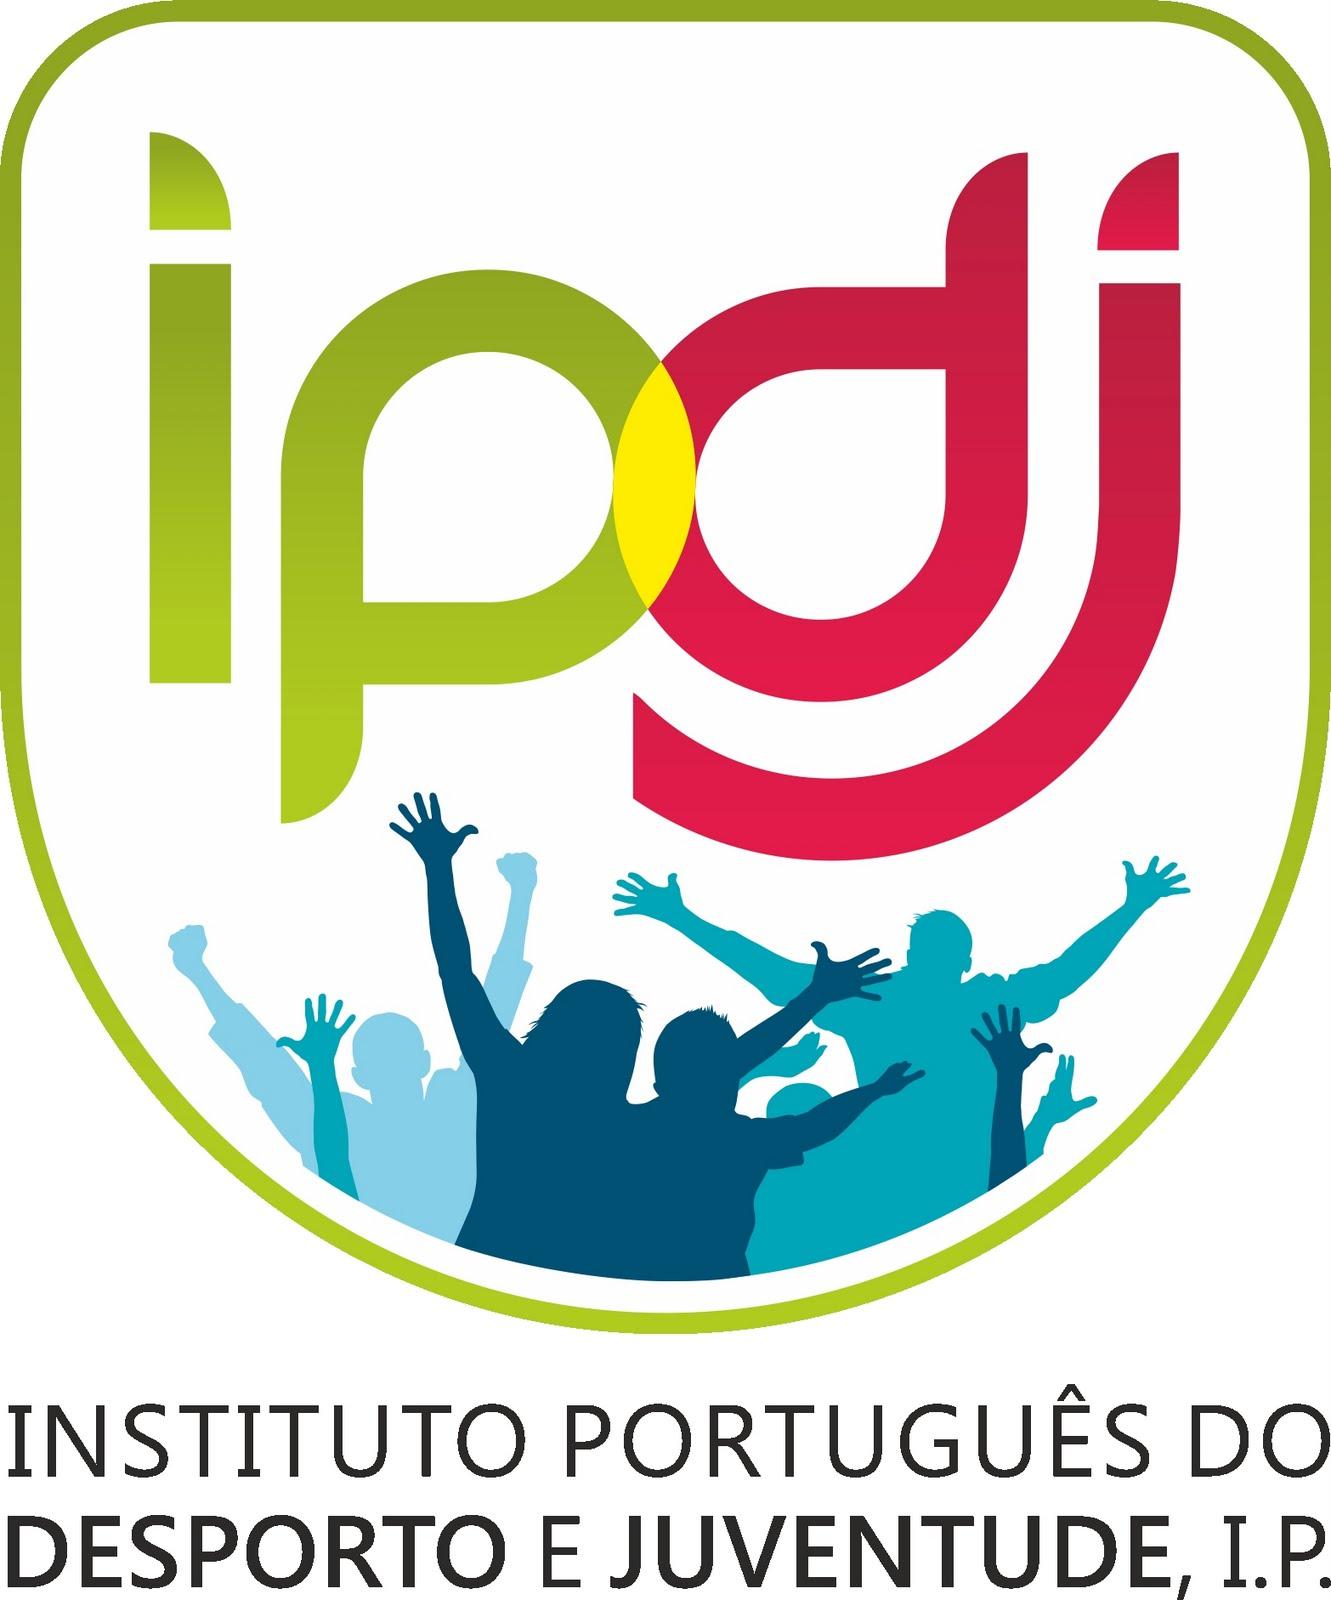 IPDJ – Instituto Português do Desporto e Juventude